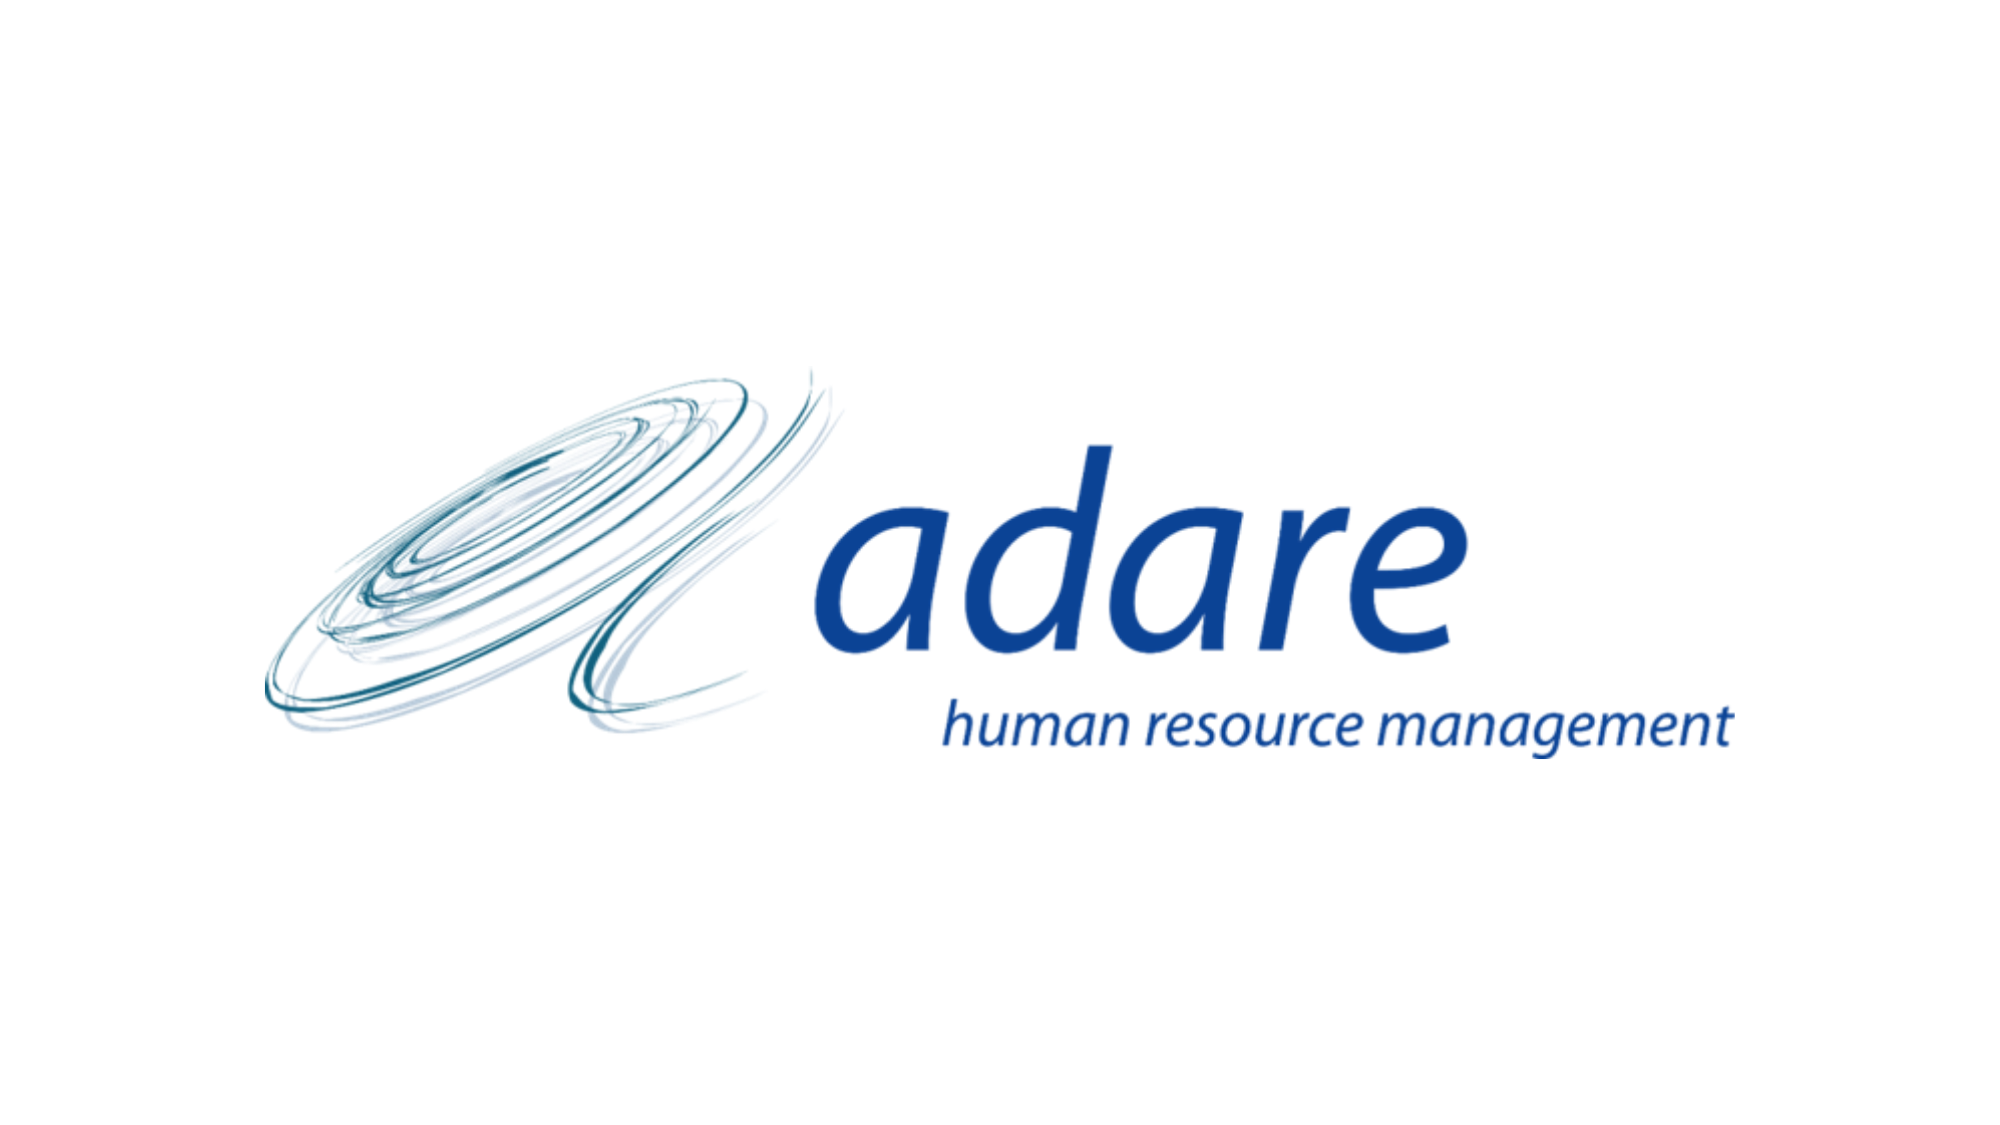 08/18/2021 - Adare Human Resource Management Webinar Series